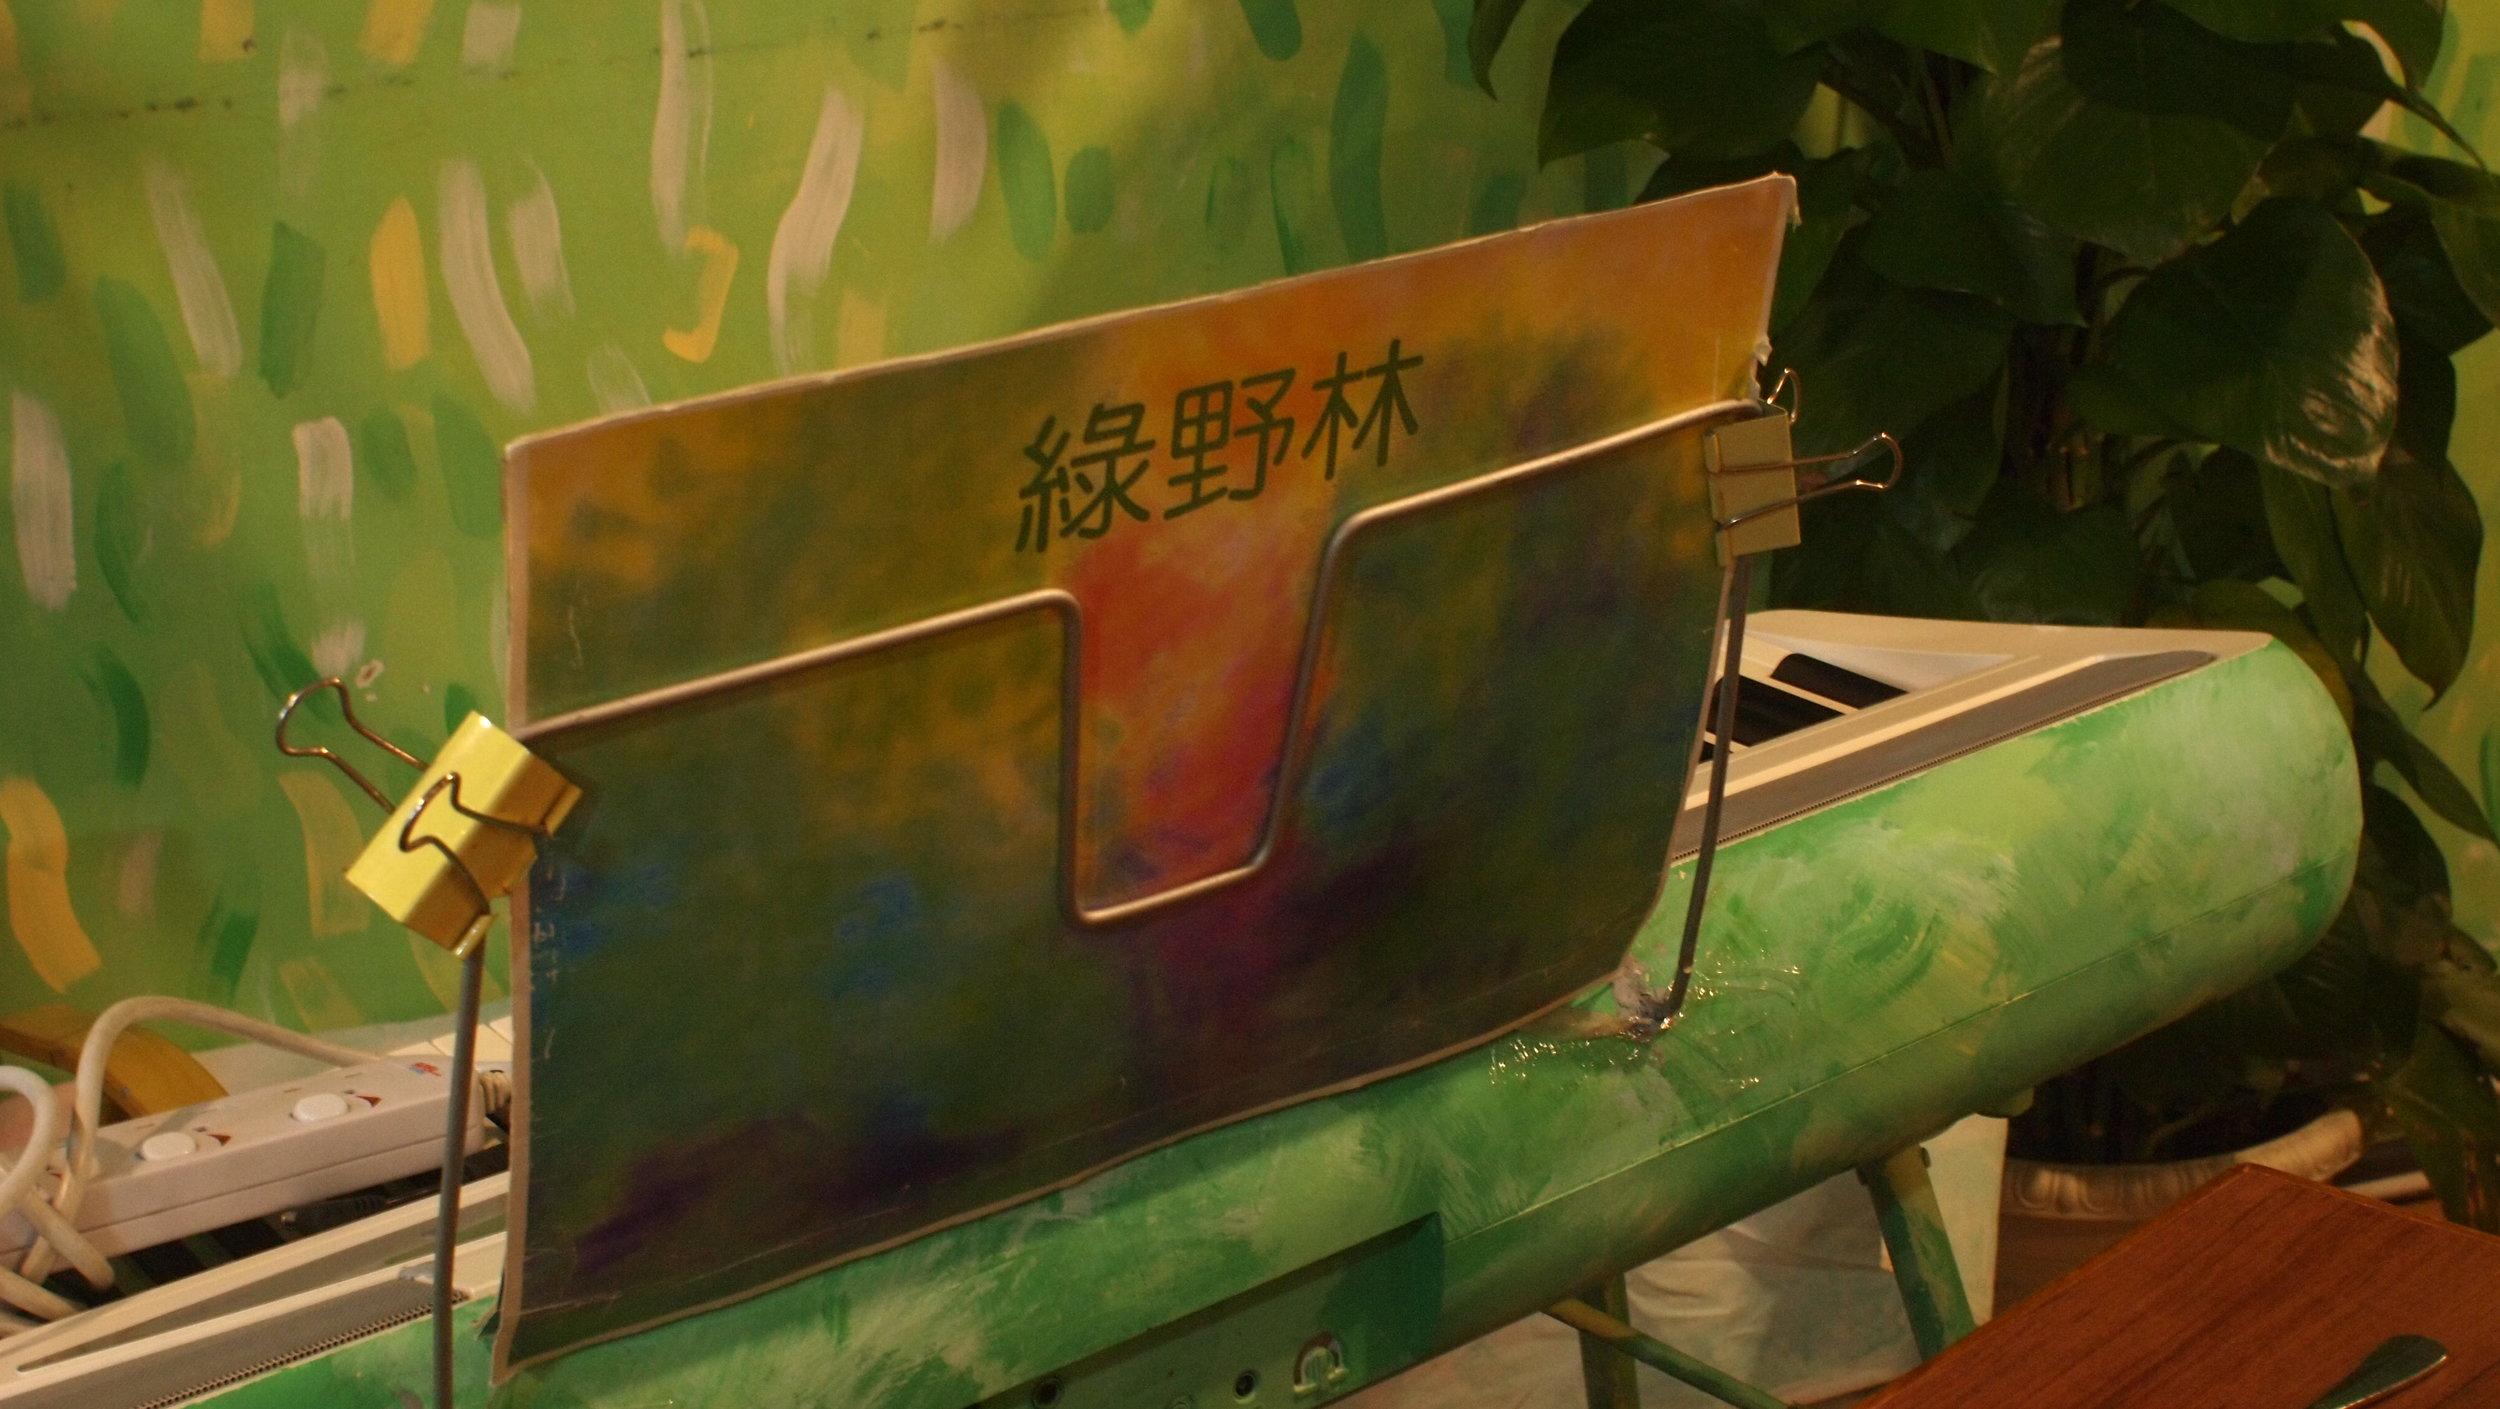 Greenwood-cafe-hongkong-raw-food.JPG